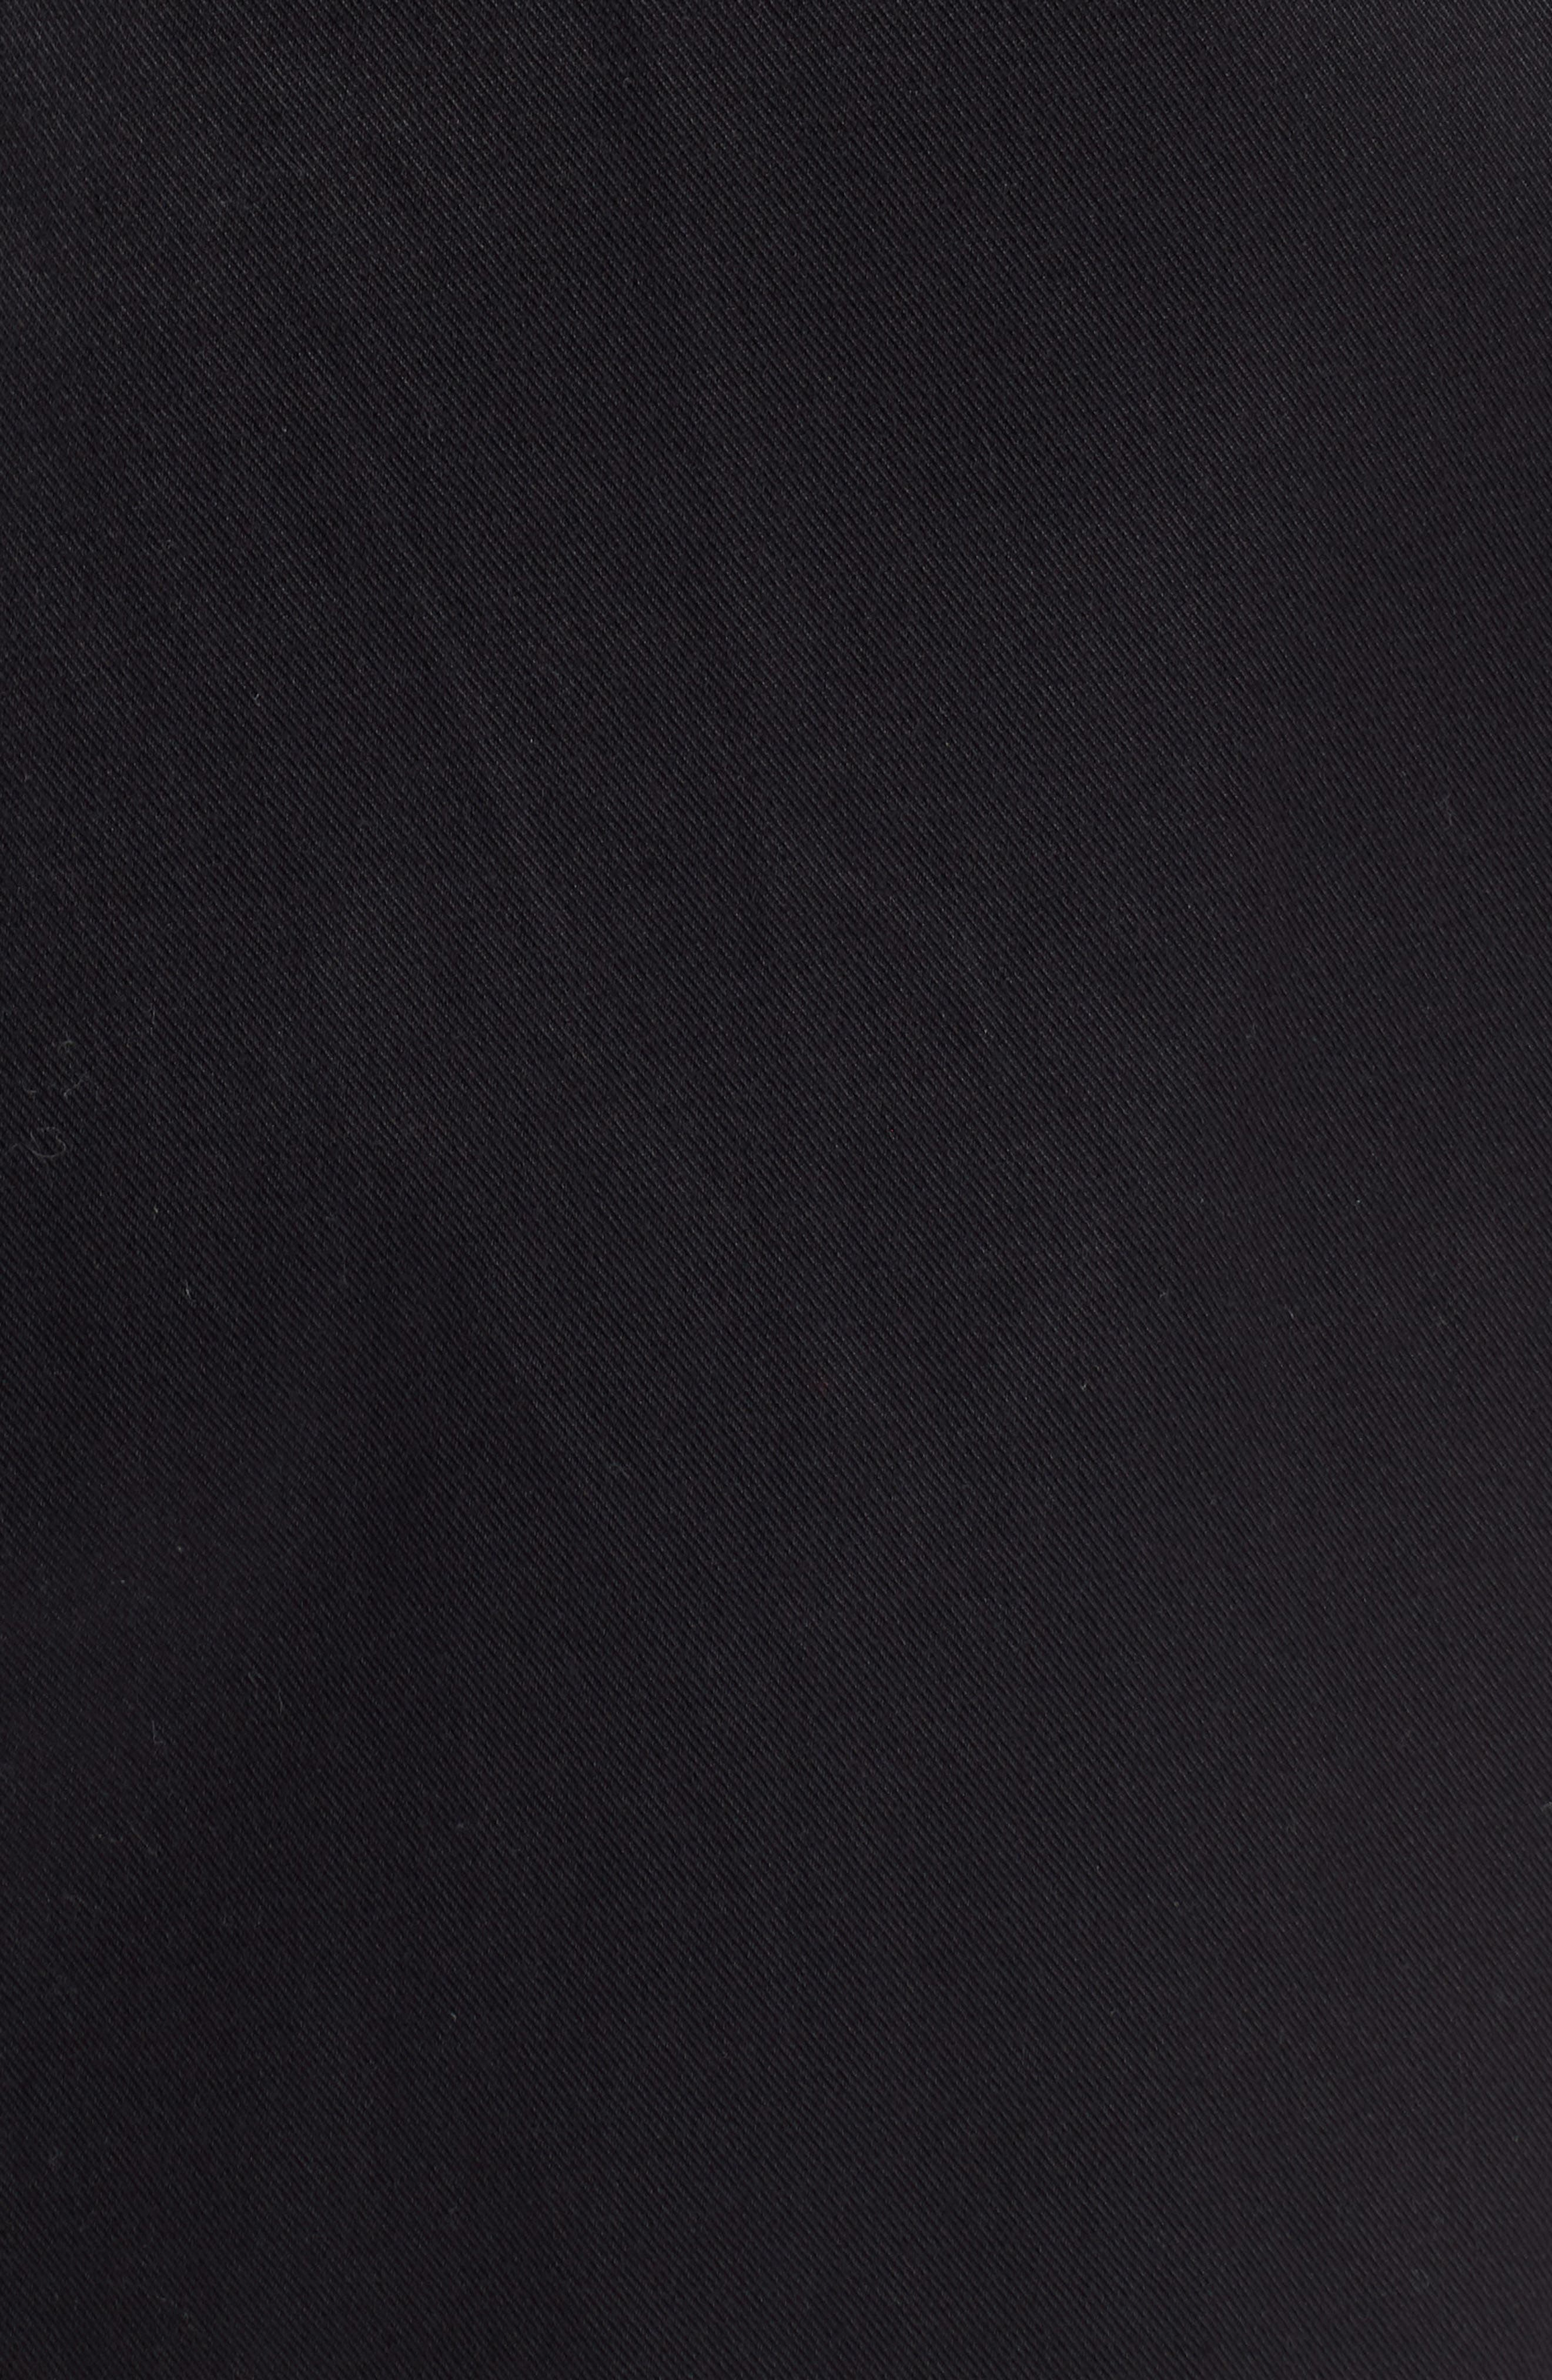 Utility Shirtdress,                             Alternate thumbnail 5, color,                             001